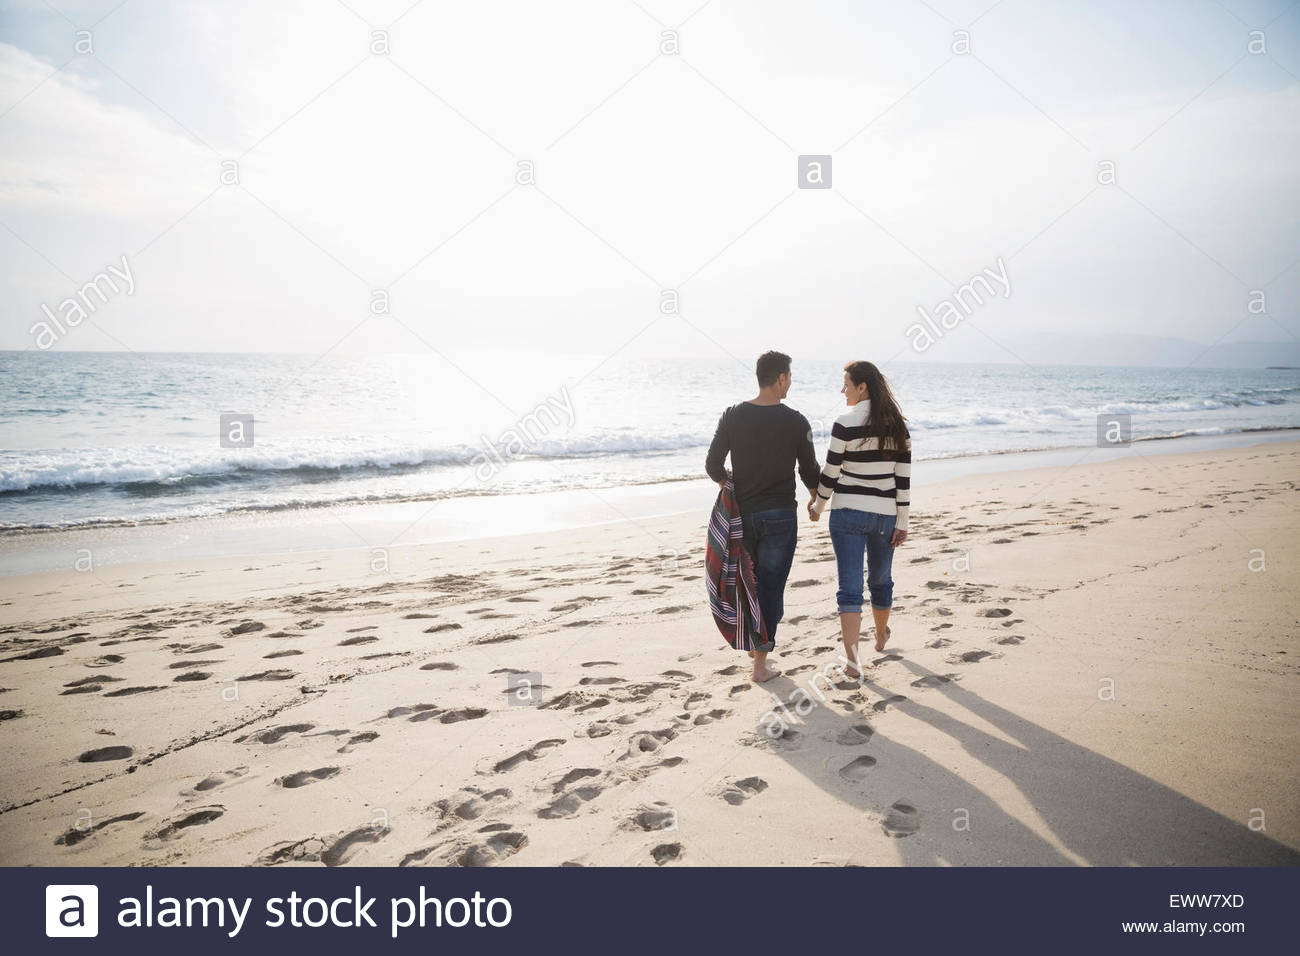 Couple walking on sunny beach Photo Stock